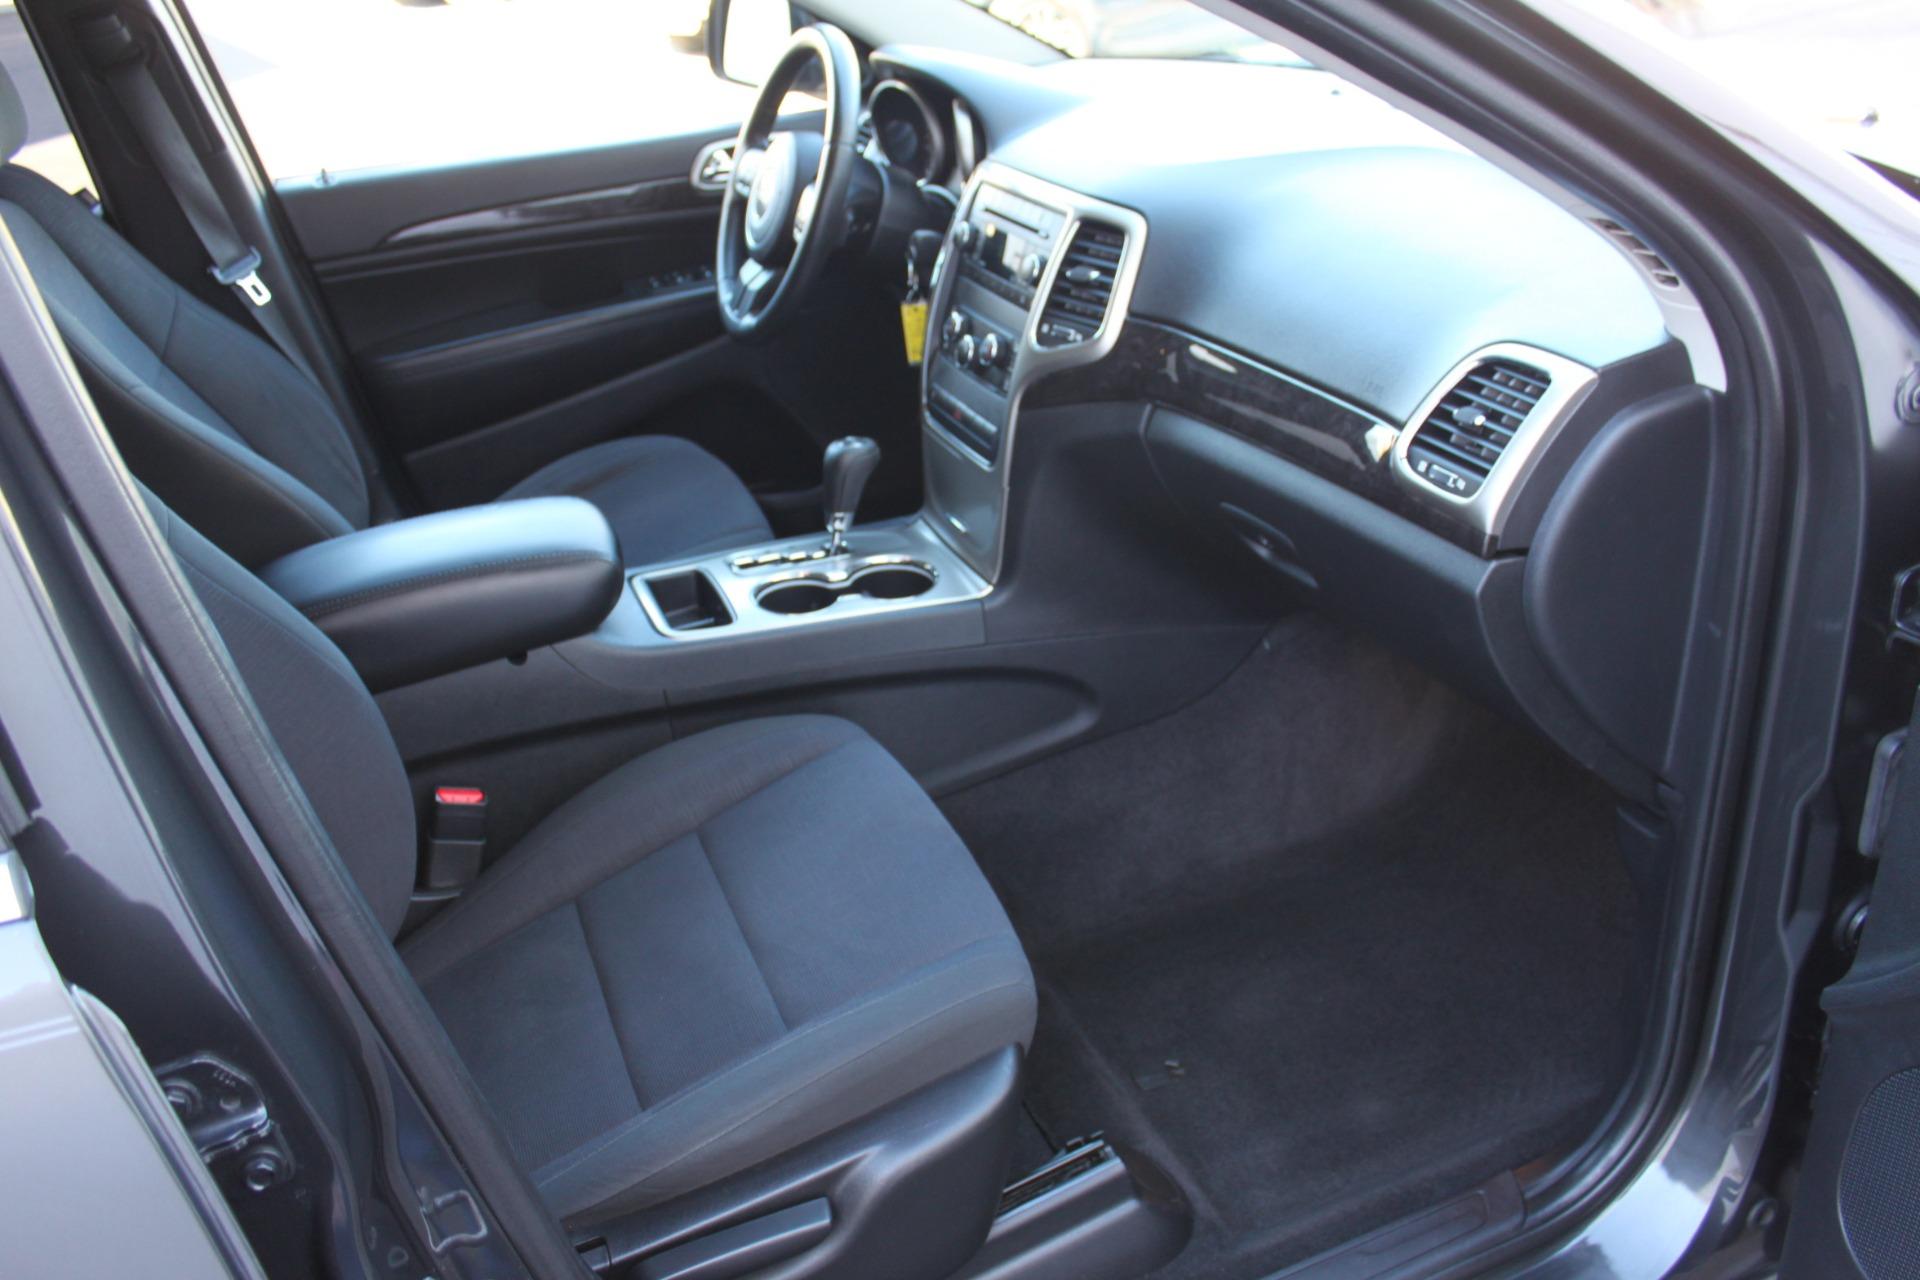 Used-2011-Jeep-Grand-Cherokee-Laredo-BMW